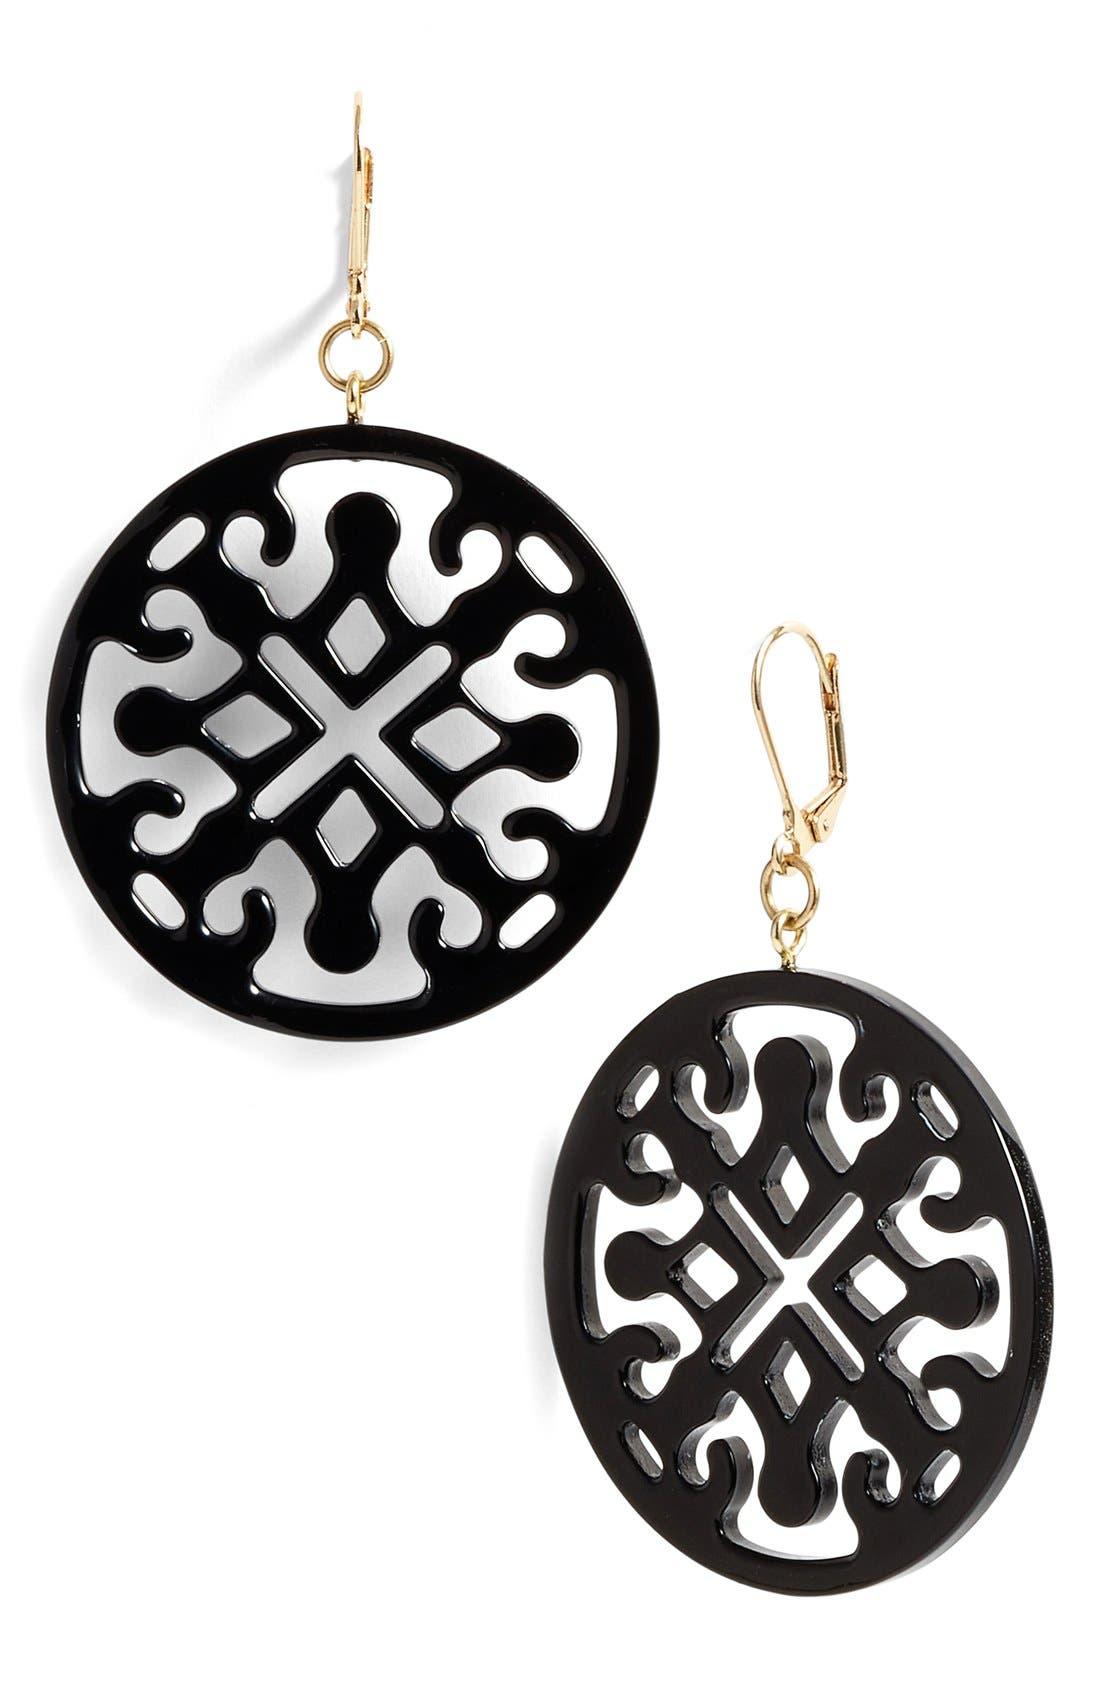 L. ERICKSON Medallion Filigree Drop Earrings